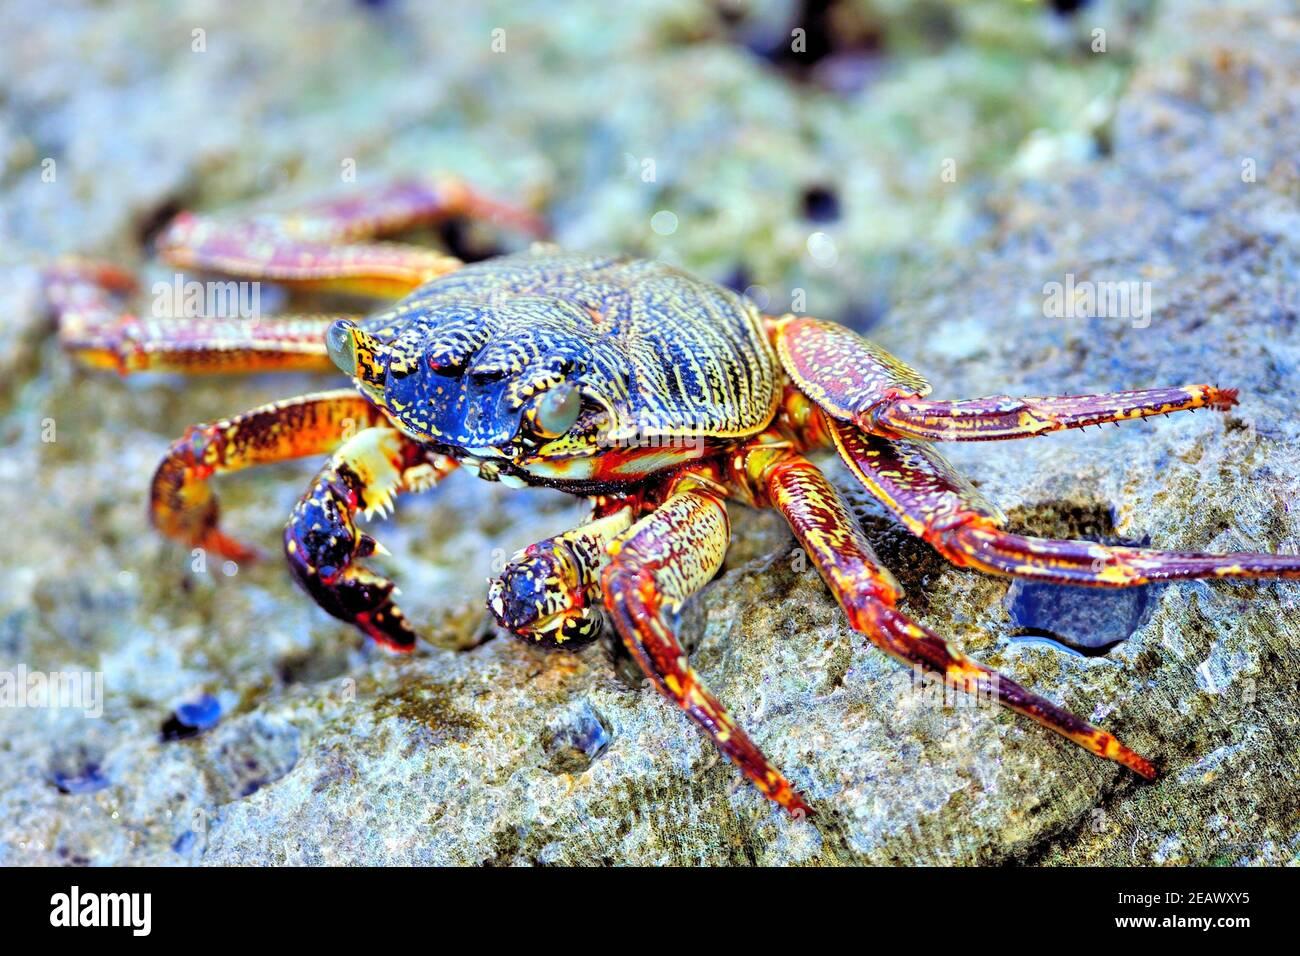 Red Rock Crab, Sea Crab, 'Grapsus adscensionis', On Rocks, Helengeli Island, Maldives Stock Photo